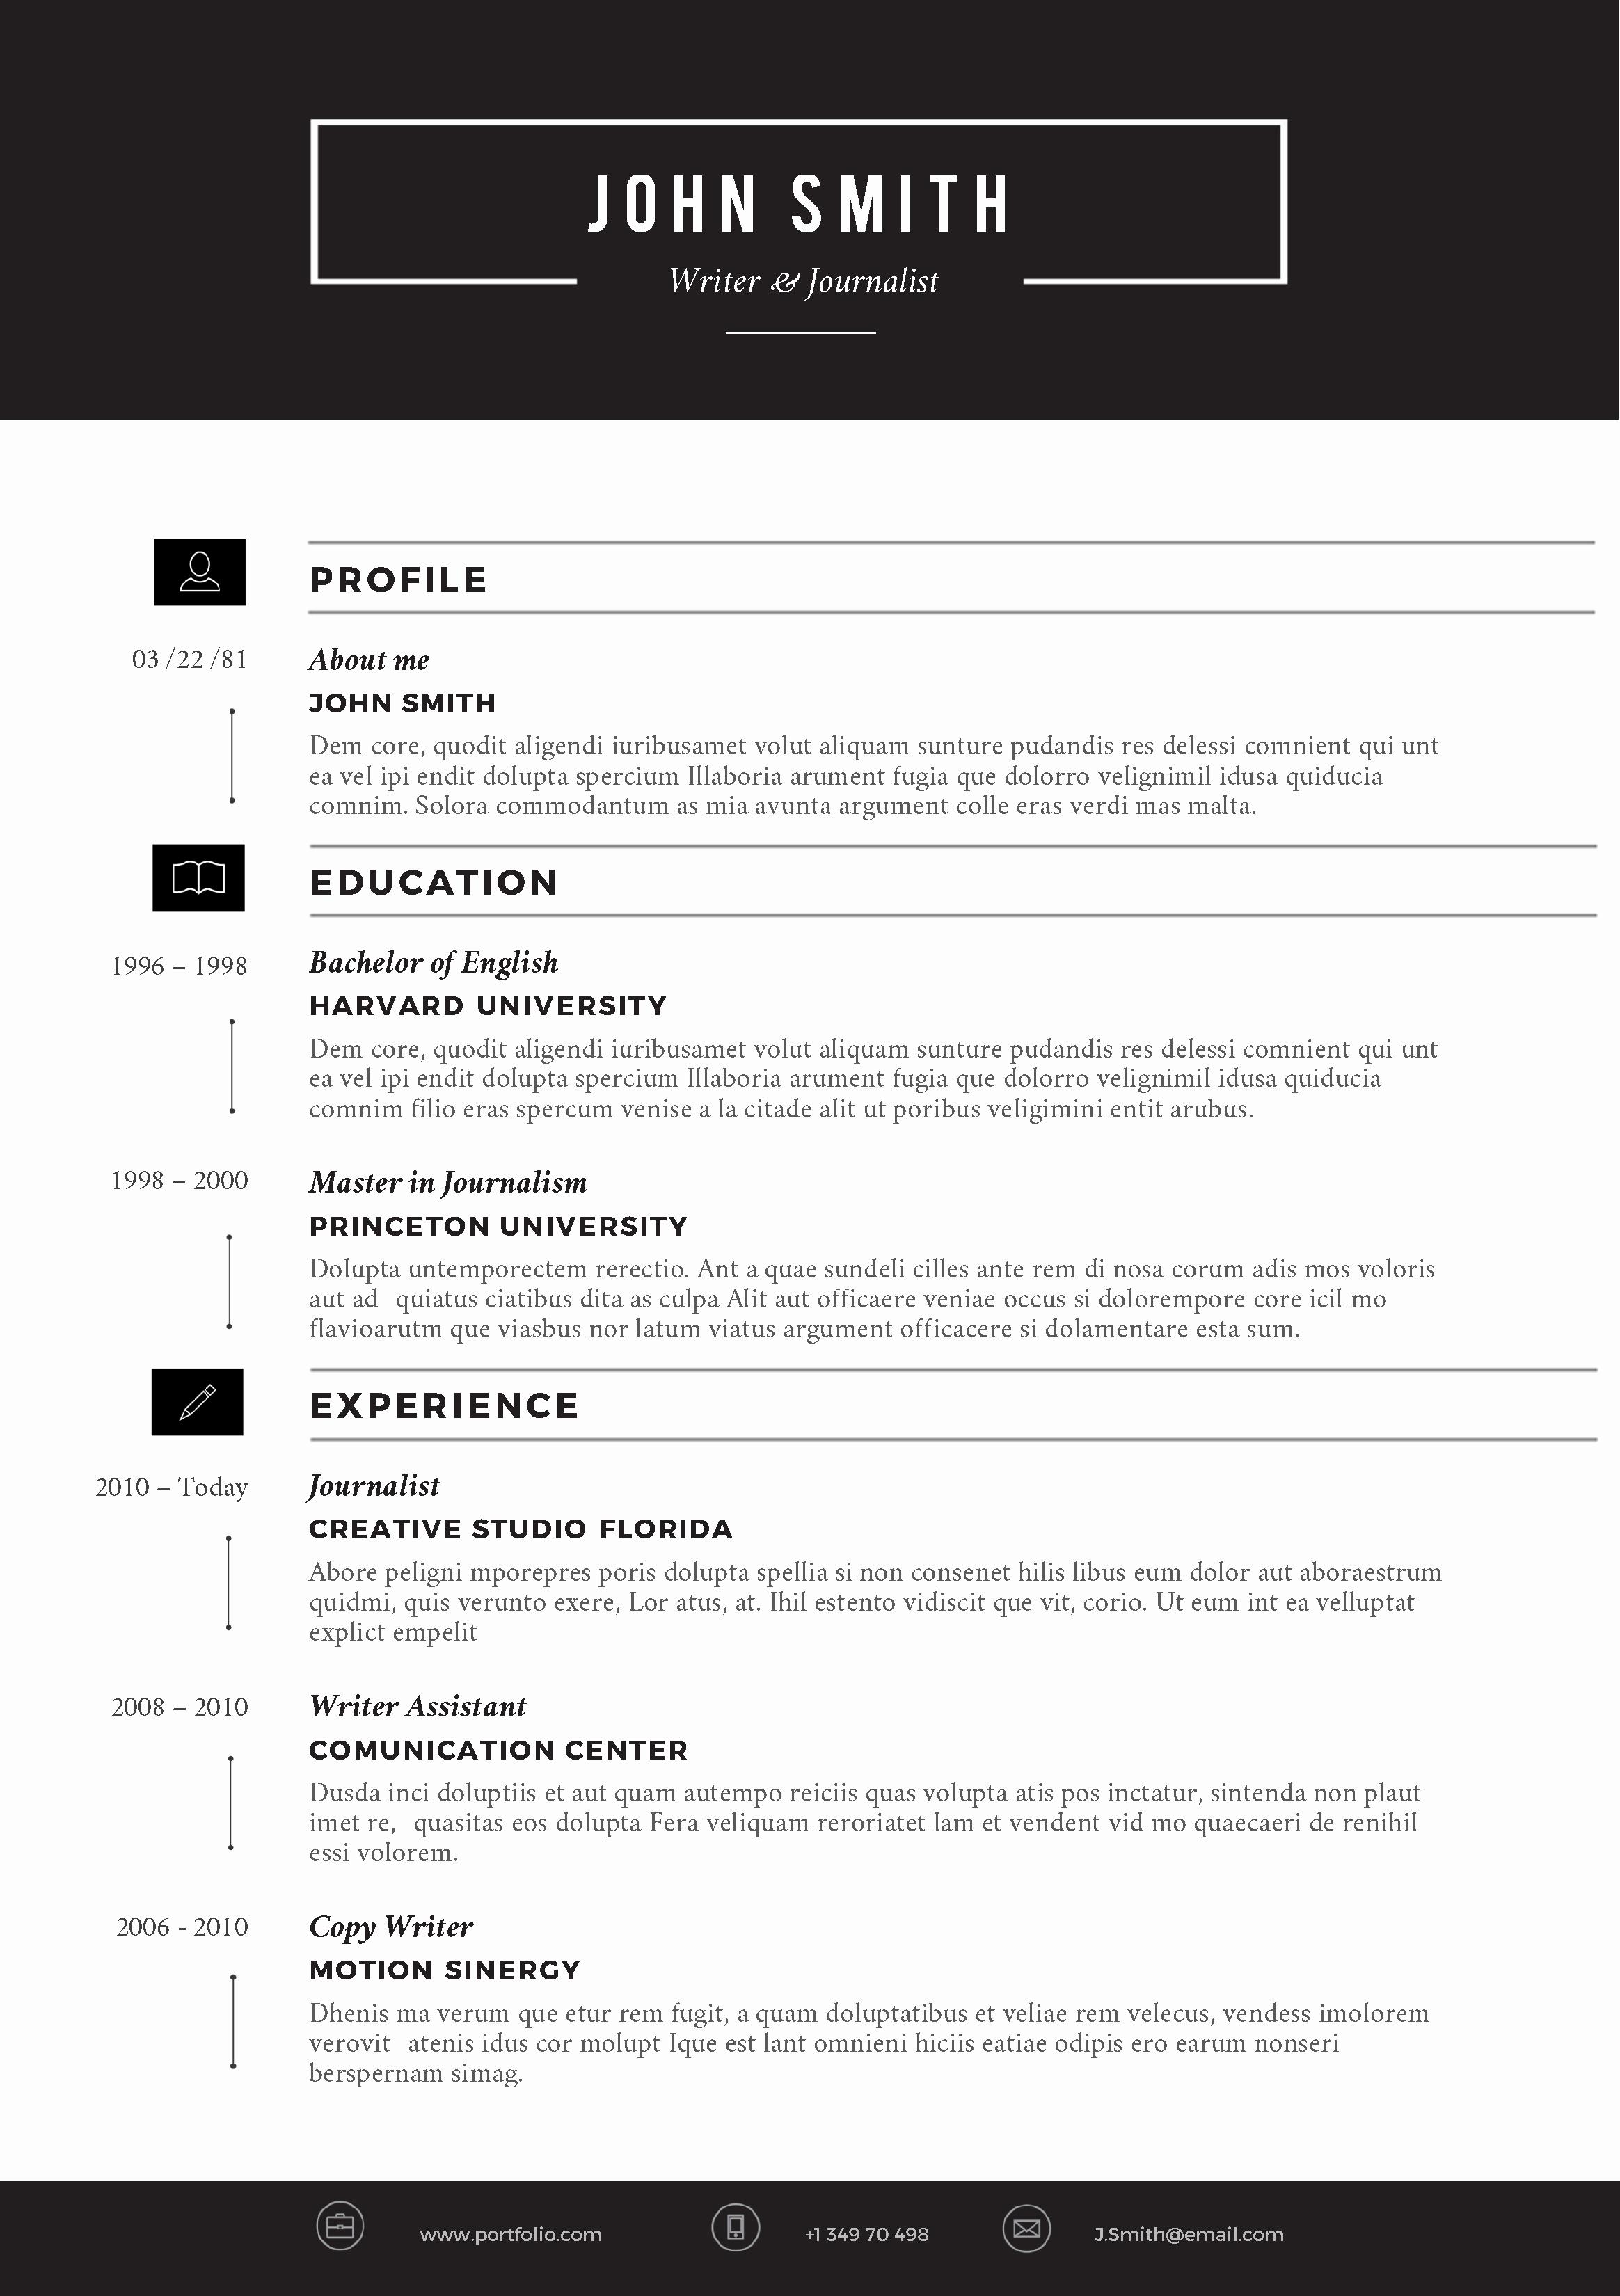 Creative Resume Template Word Inspirational Creative Resume Template by Cvfolio Resumes